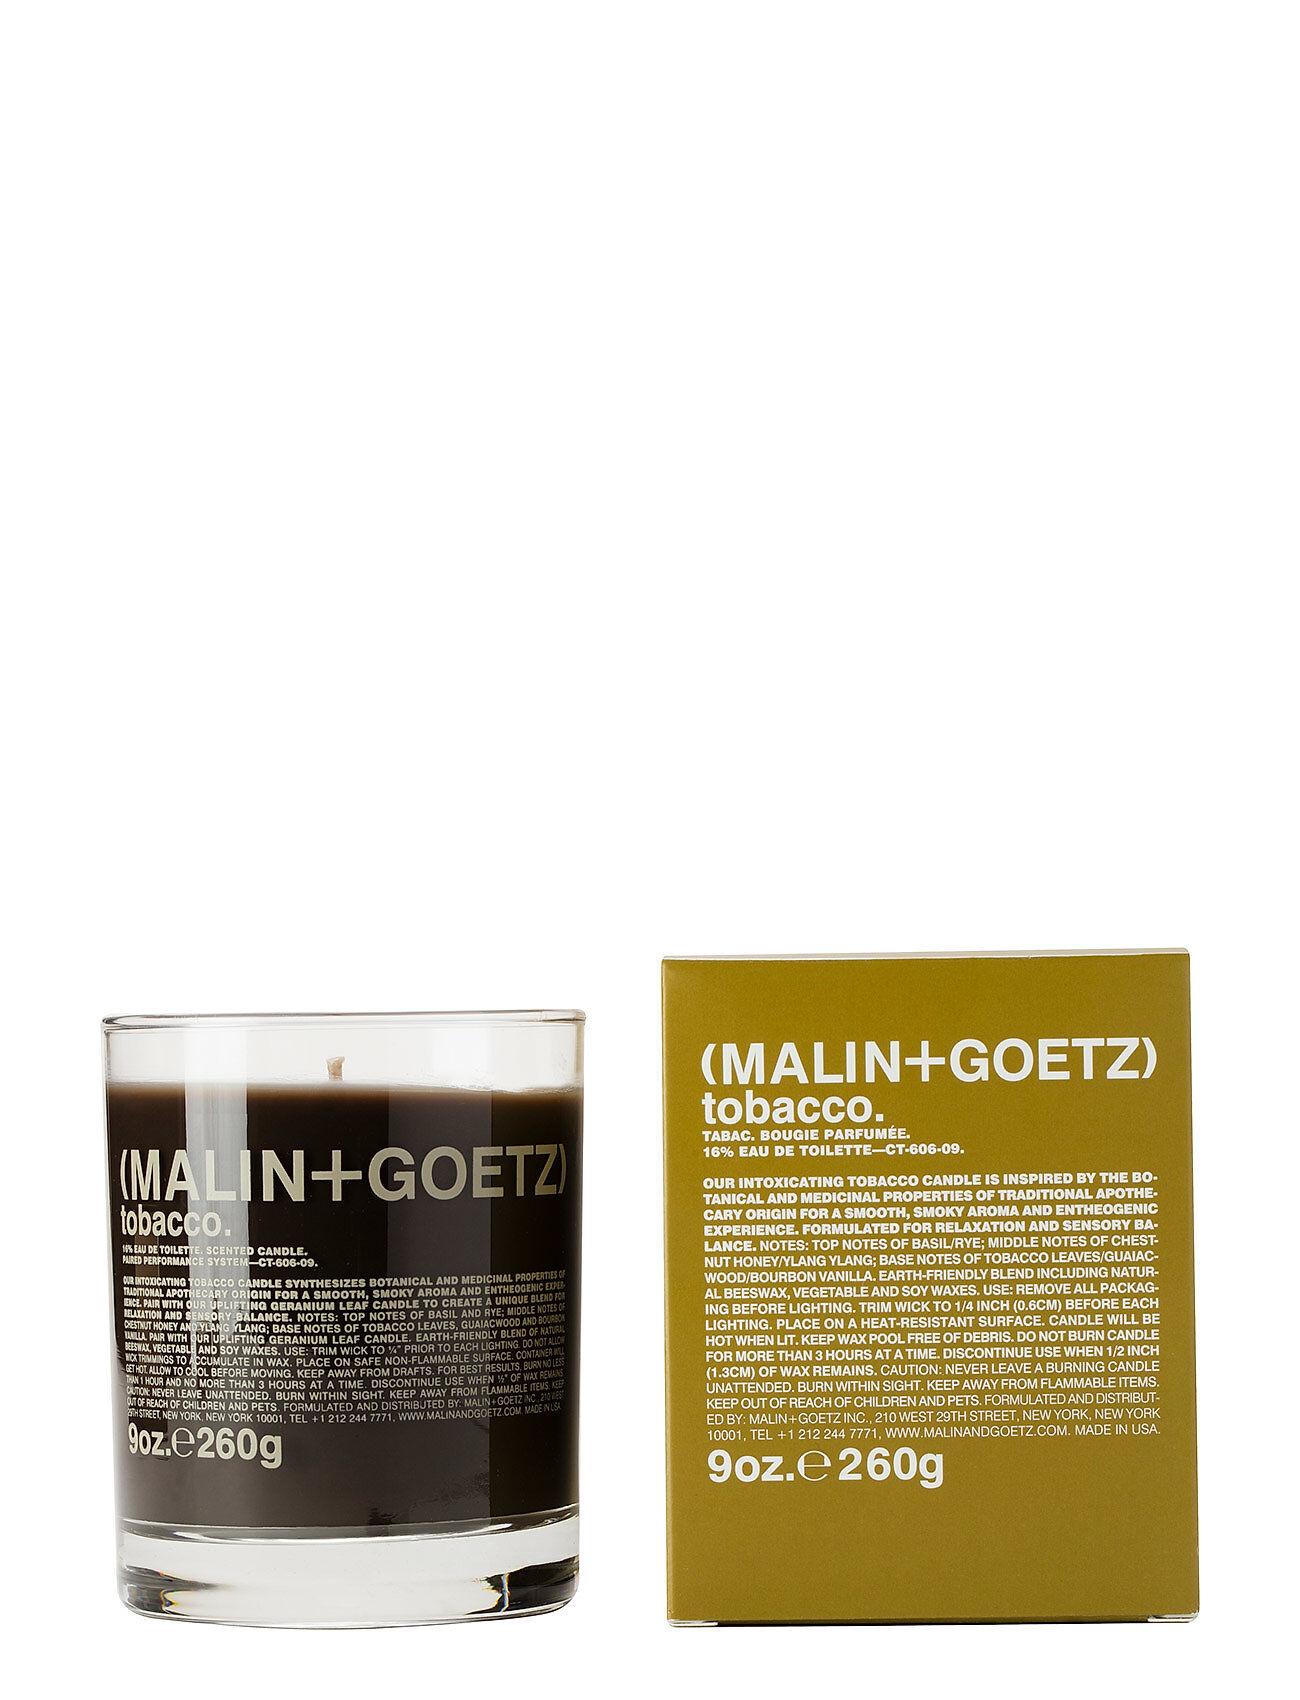 MALIN+GOETZ Tobacco Candle Hajuvesi Parfyymi Nude MALIN+GOETZ